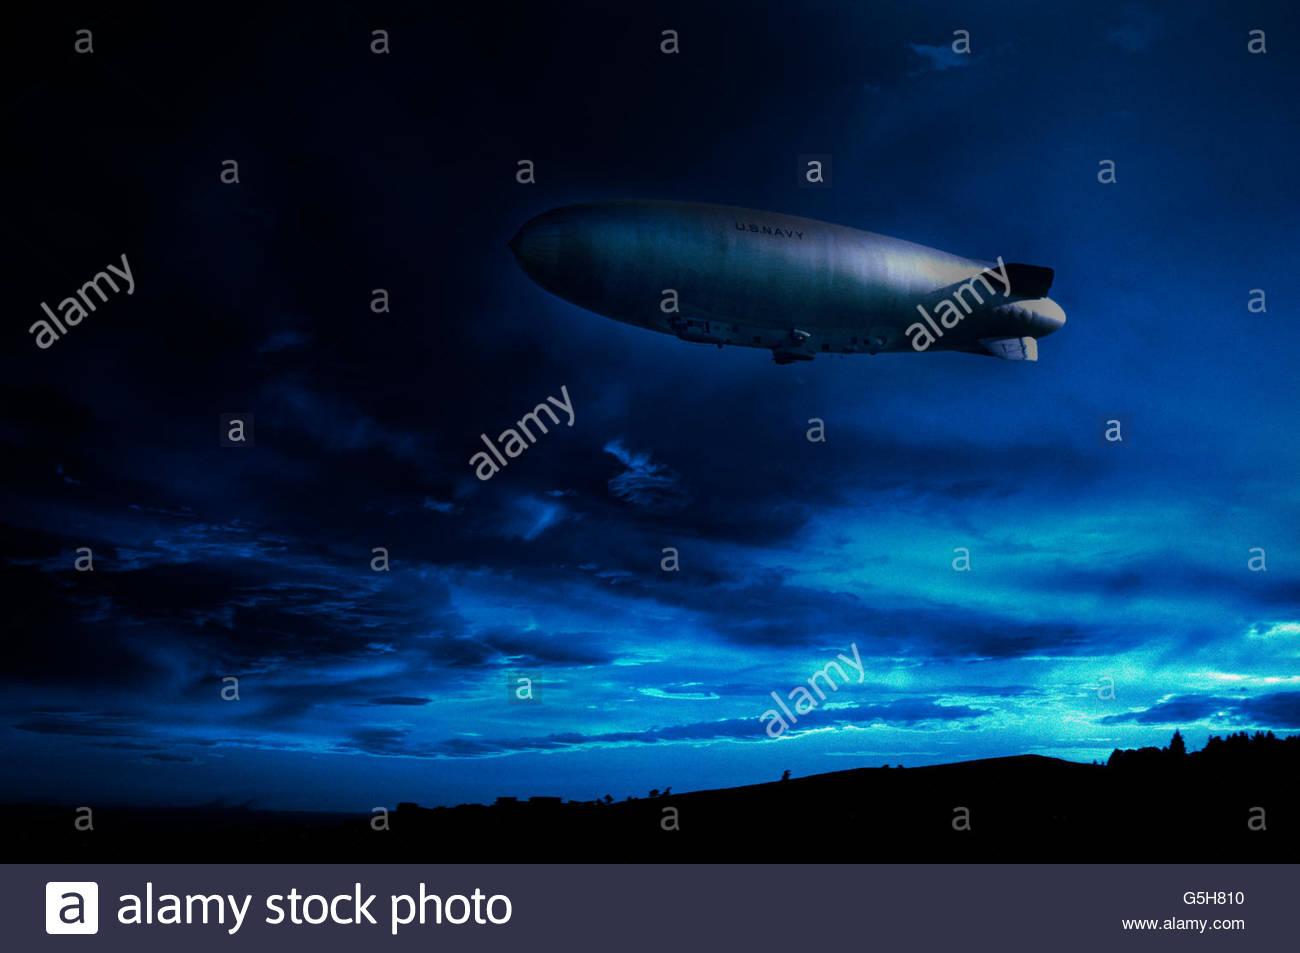 US Navy Blimp over city, California, USA - Stock Image